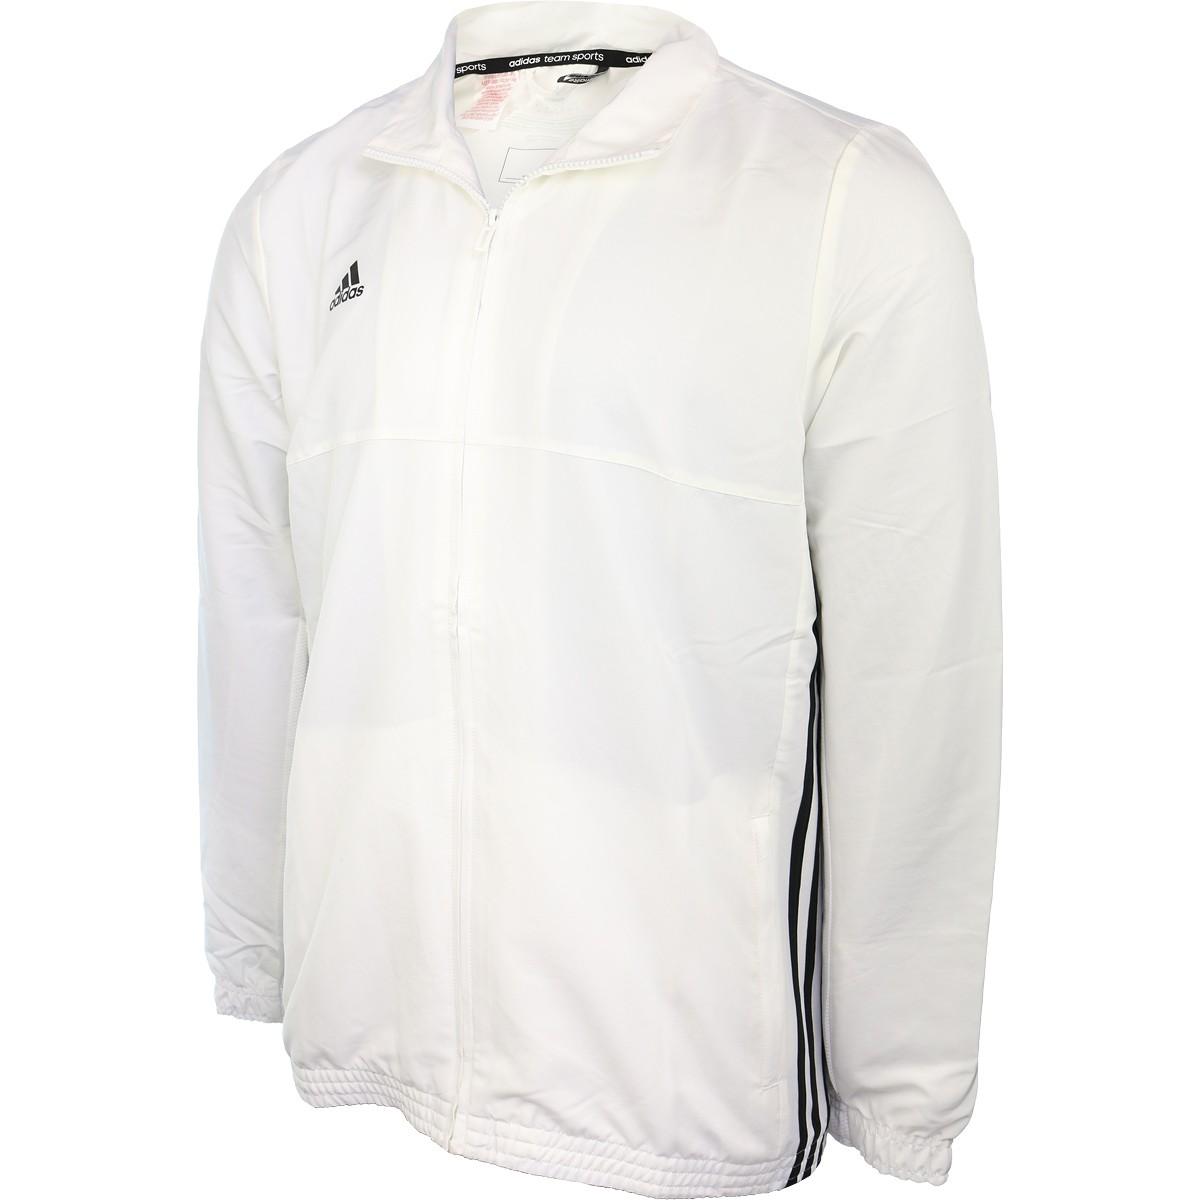 Tennispro Veste Adidas Team Veste Junior Adidas wX7xXqU